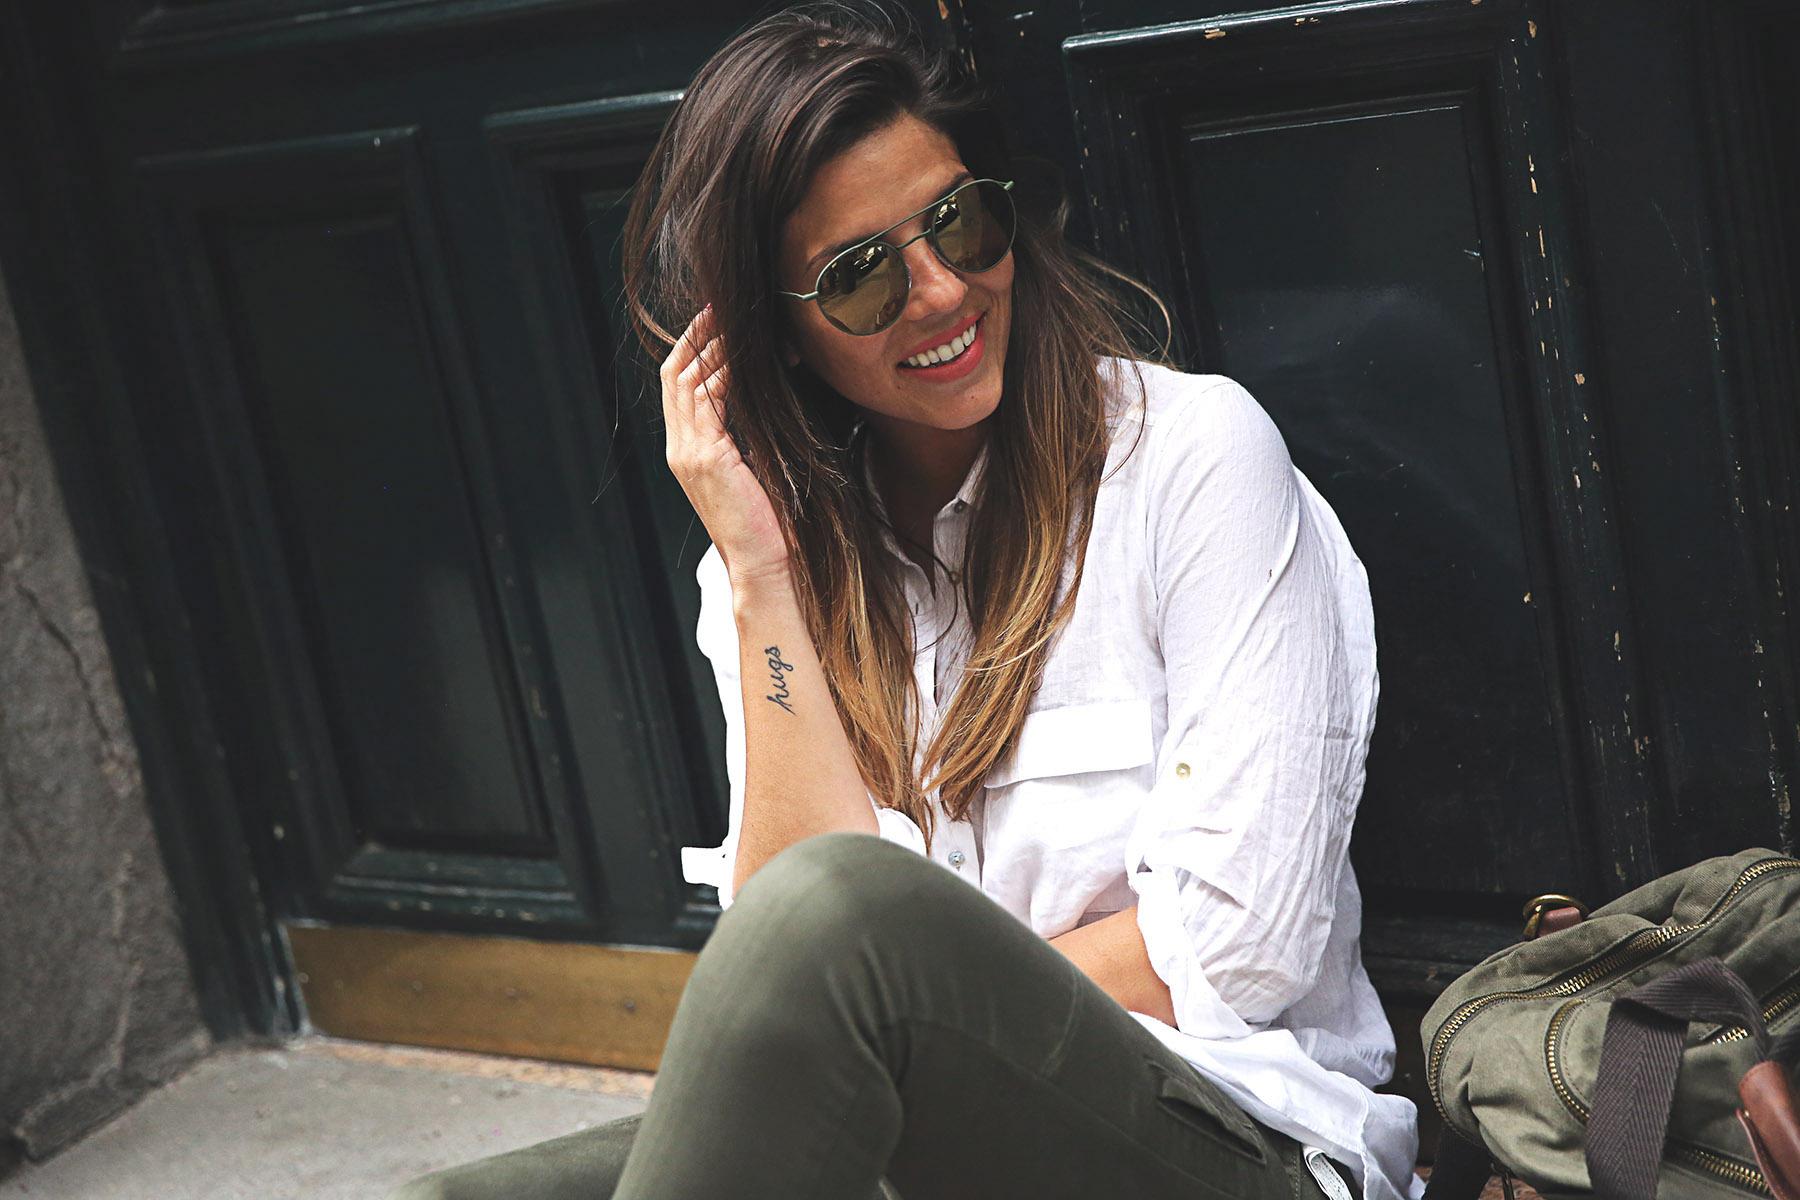 trendy-taste-look-outfit-street-style-steve-madden-ootd-blog-blogger-fashion-spain-moda-españa-safari-traveling-viaje-bolsa-bag-khaki-caqui-pants-sandalias-zuecos-6